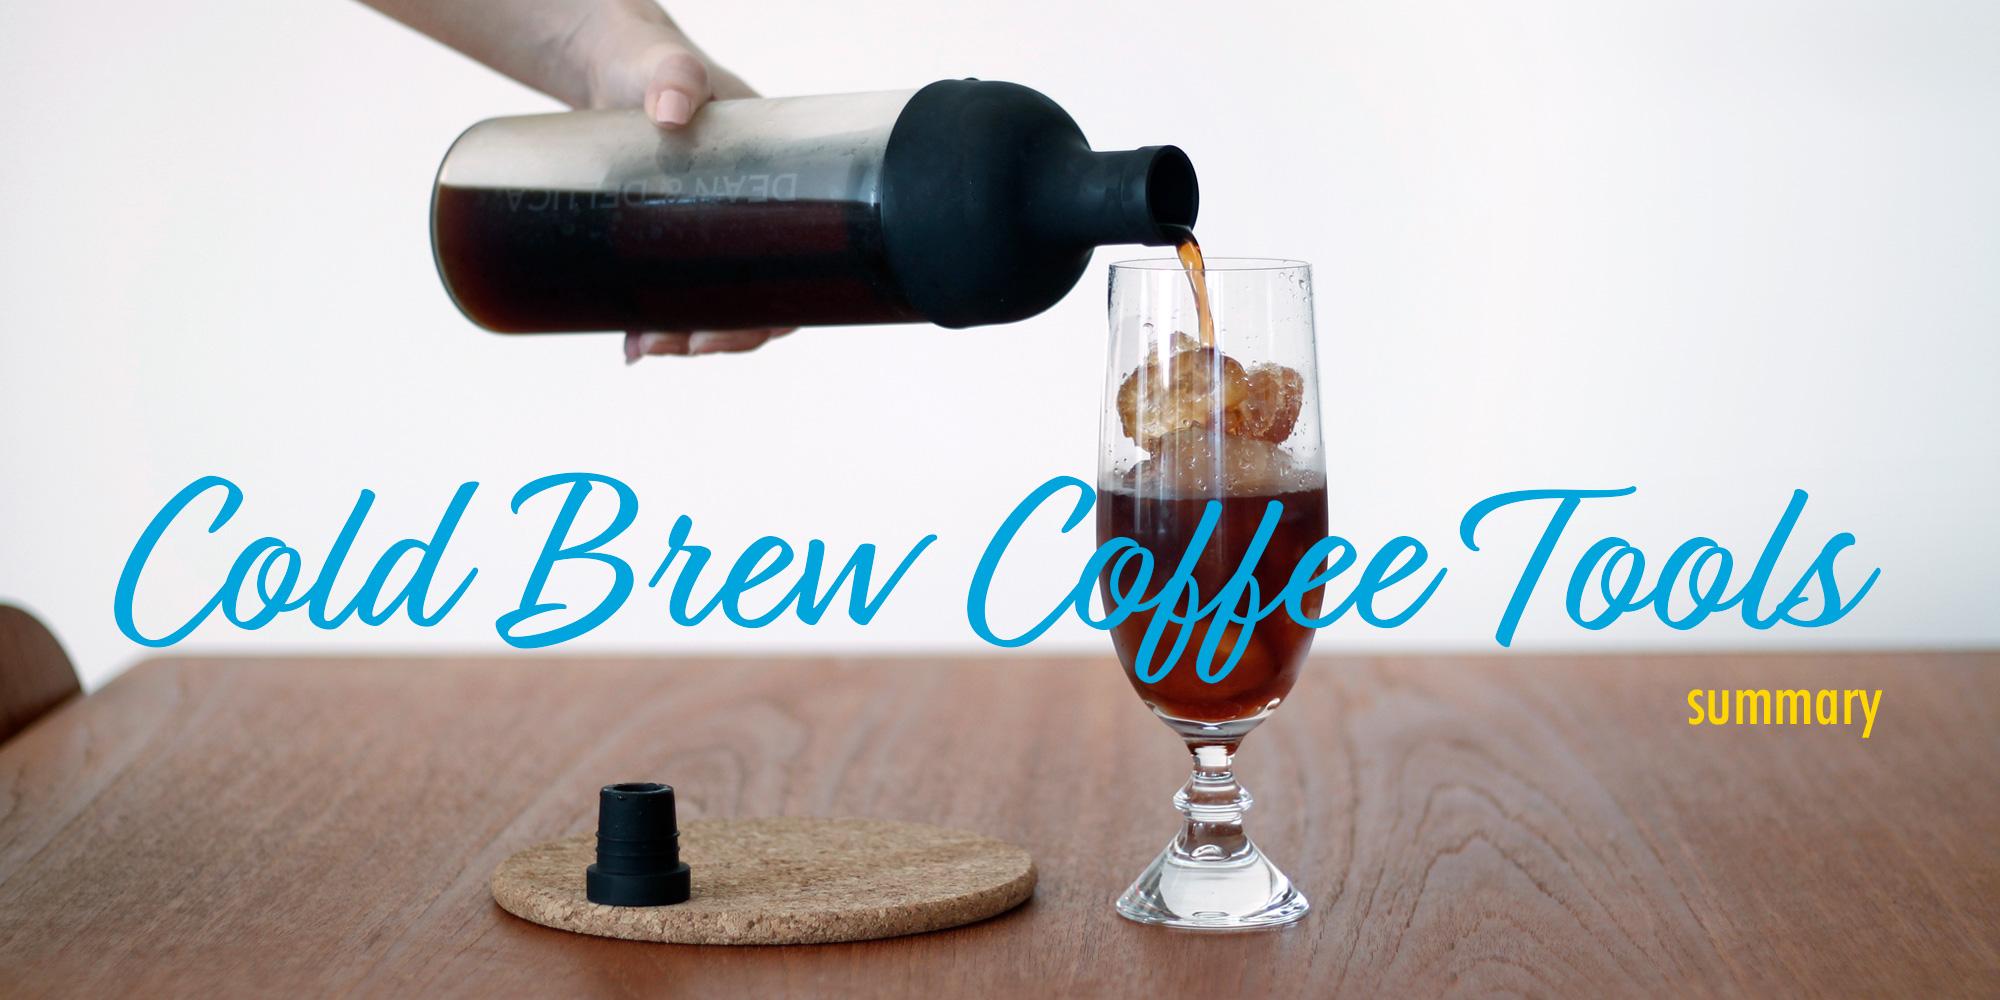 COLDBREW COFFEE MAKER